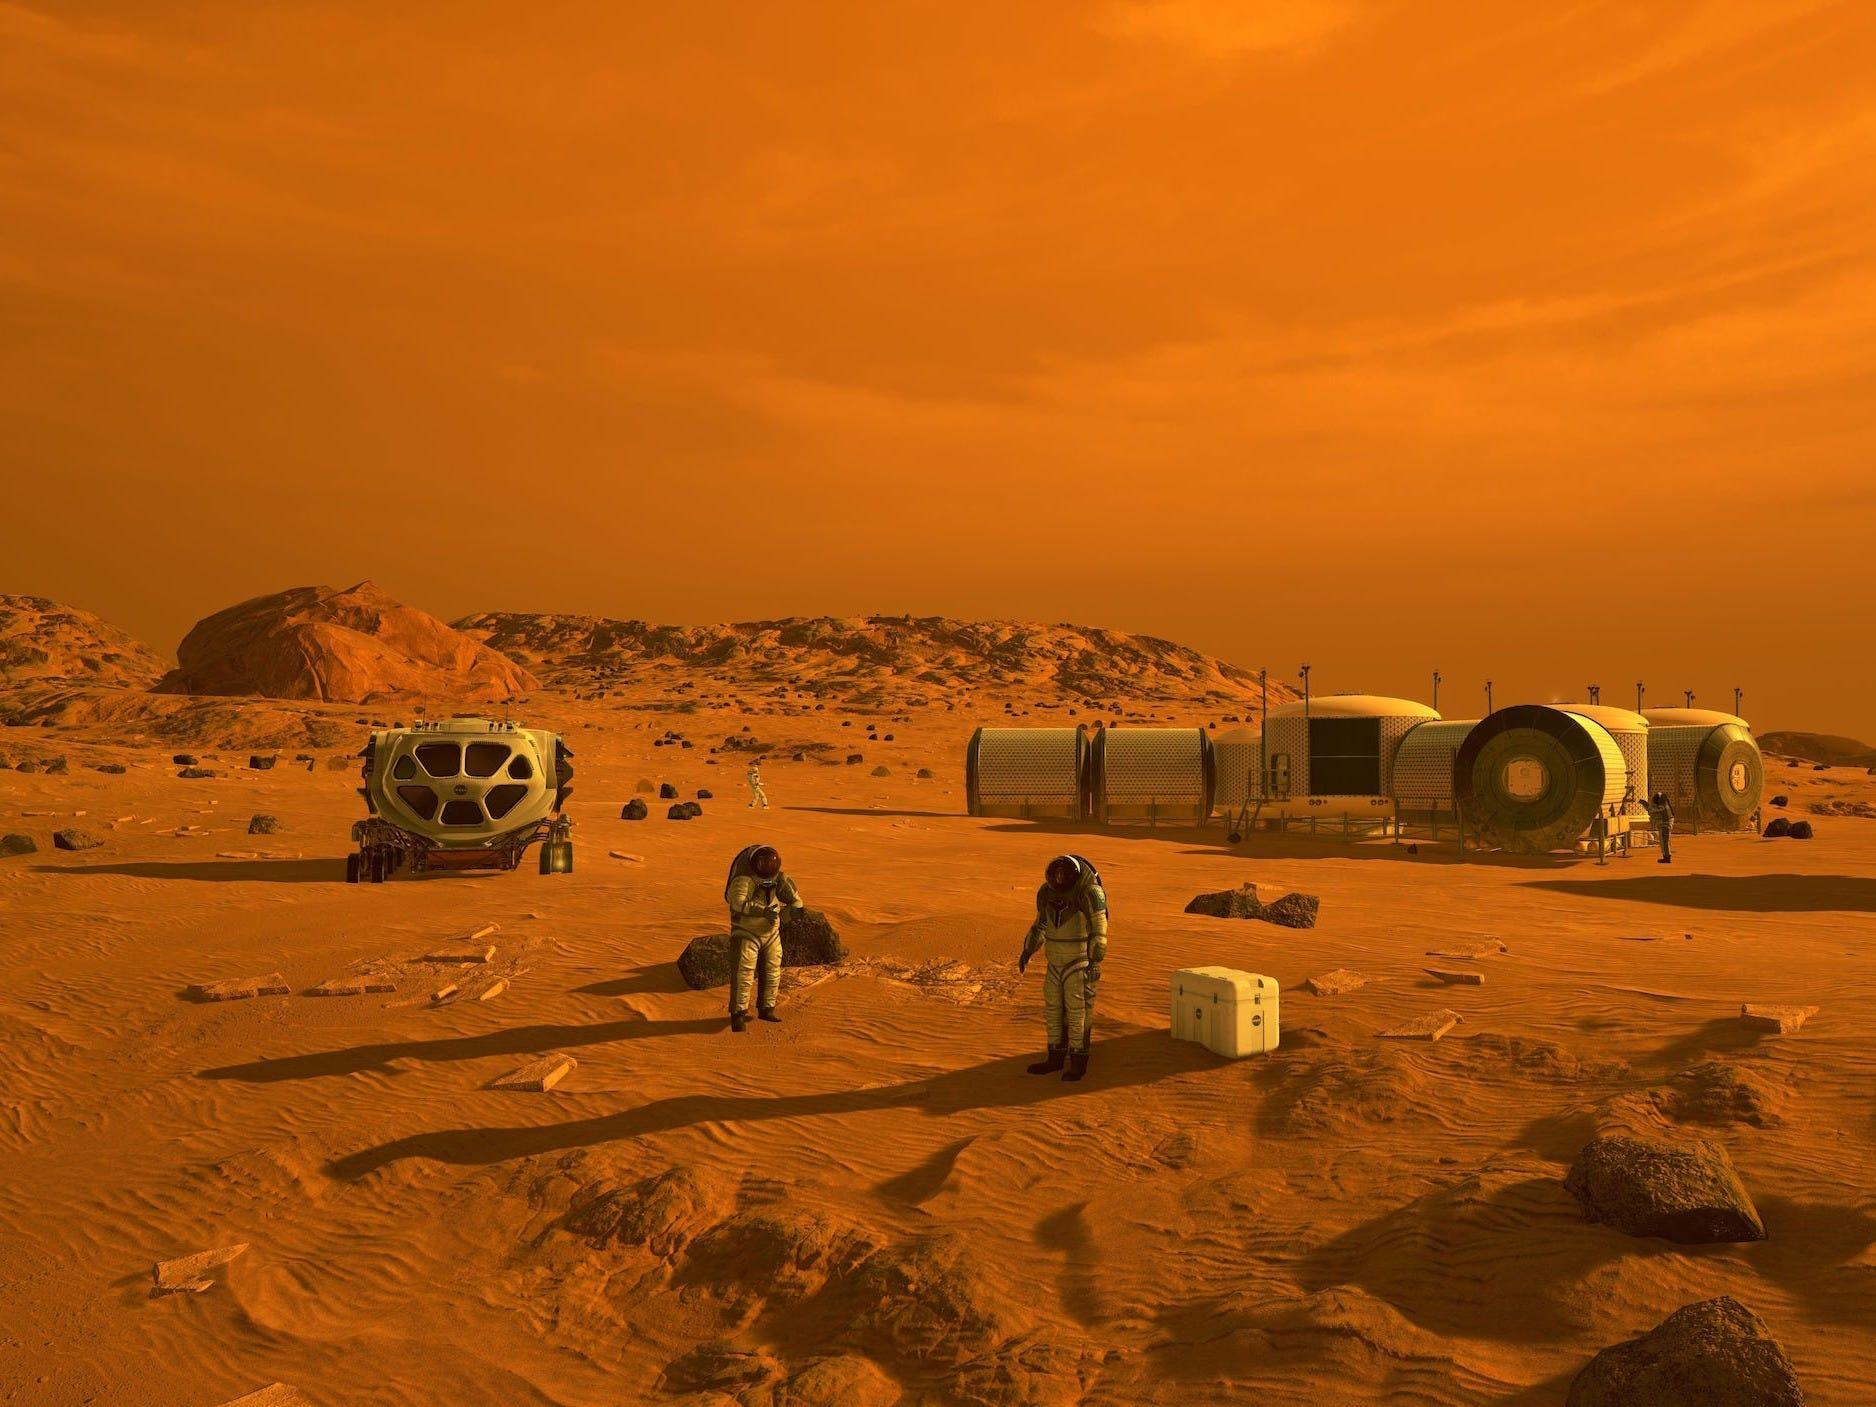 La Nasa Aujoud'hui Son Rover Perseverance Pour Mars, Toutes Les Infos Ici